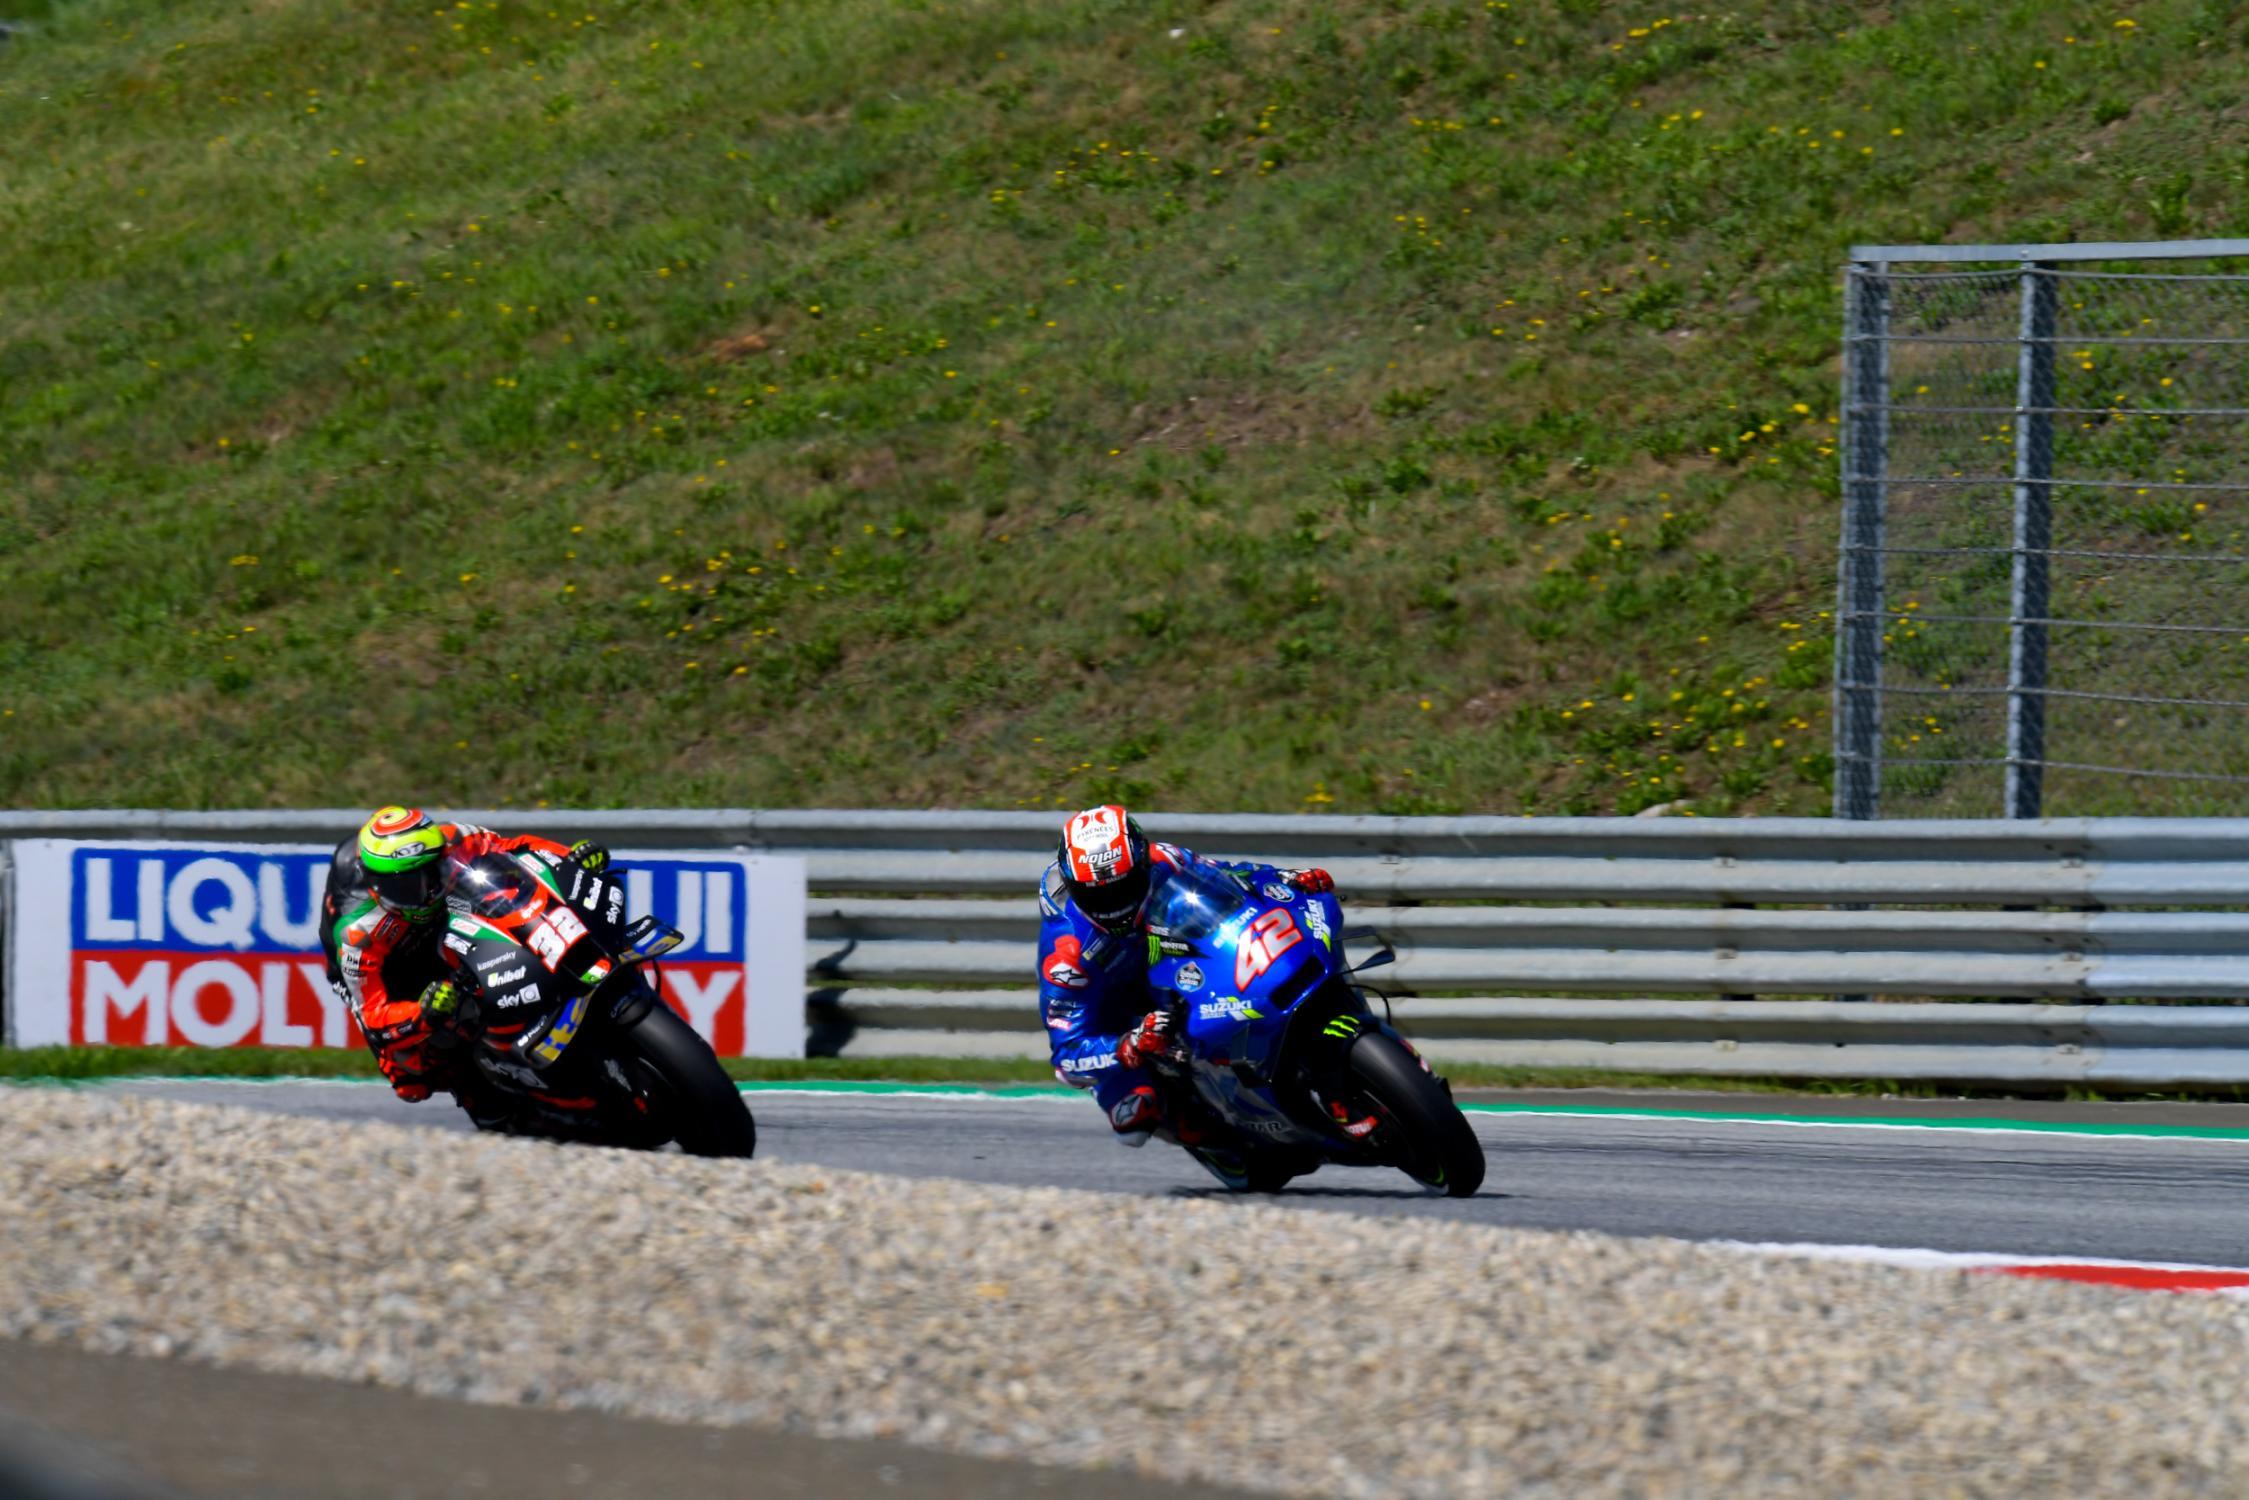 Lorenzo Savadori, Alex Rins, Team Suzuki Ecstar, Michelin® Grand Prix of Styria